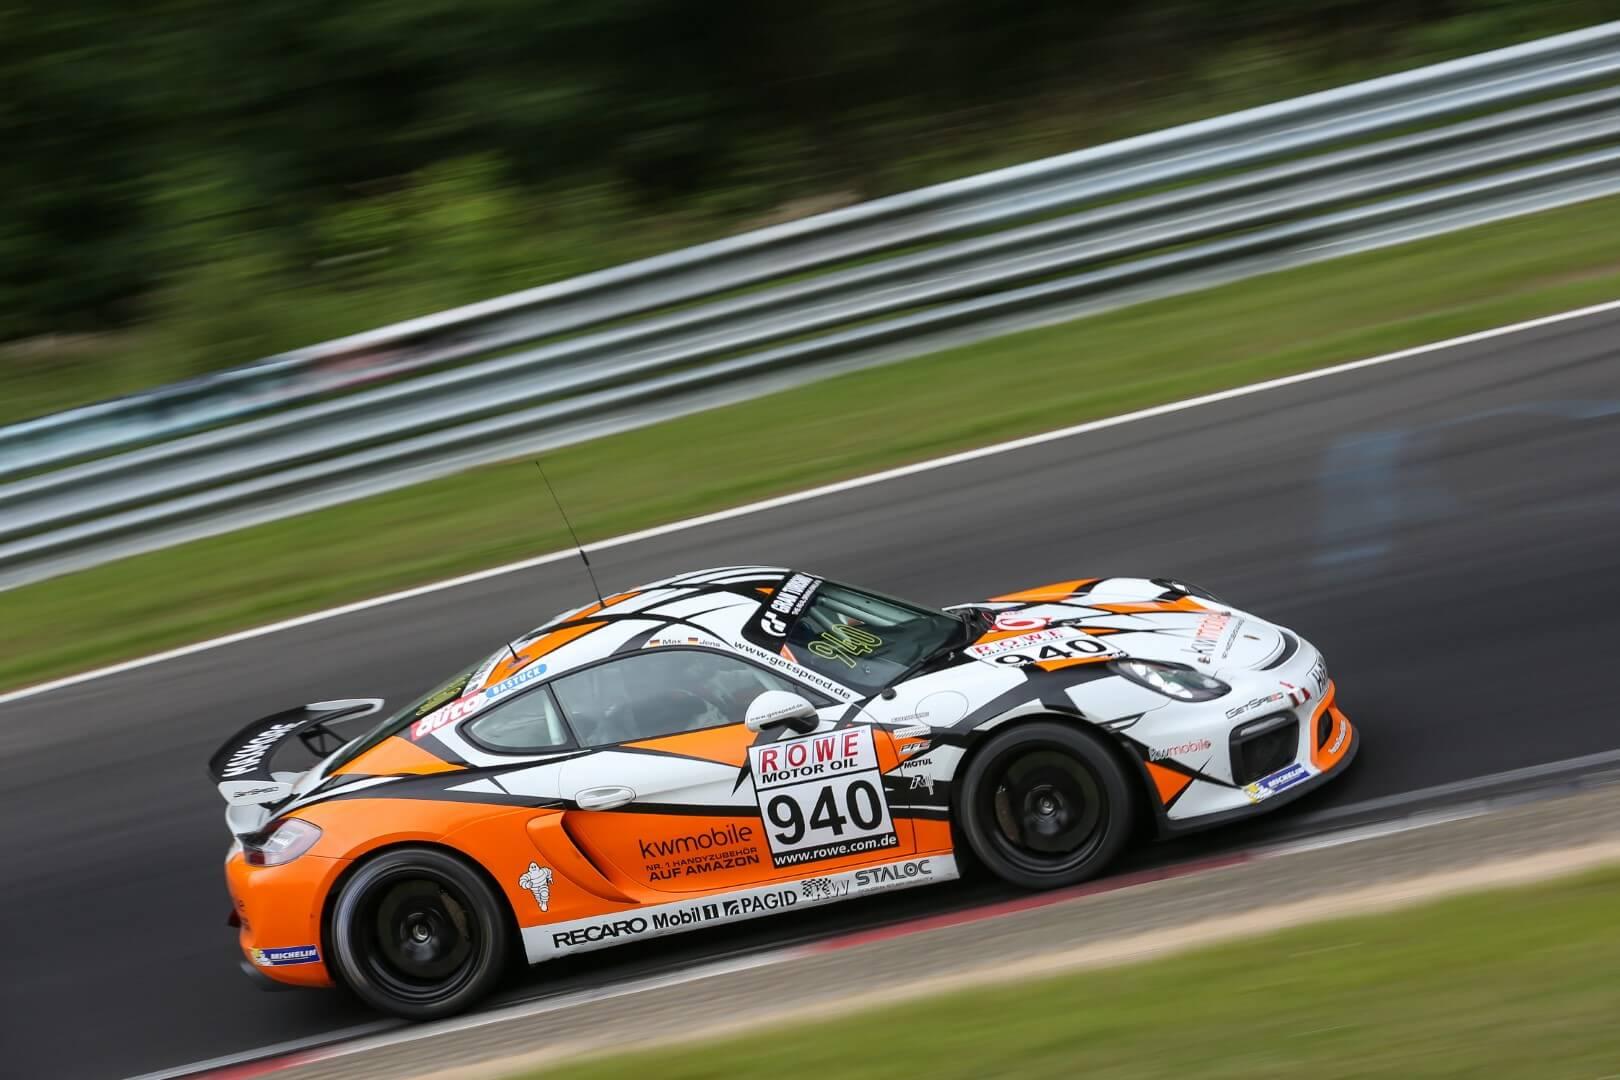 VLN 3. Lauf 2018 - Foto: Gruppe C Photography; #940 Porsche Cayman GT4 CS, GIGASPEED Team GetSpeed Performance: Max, Jens